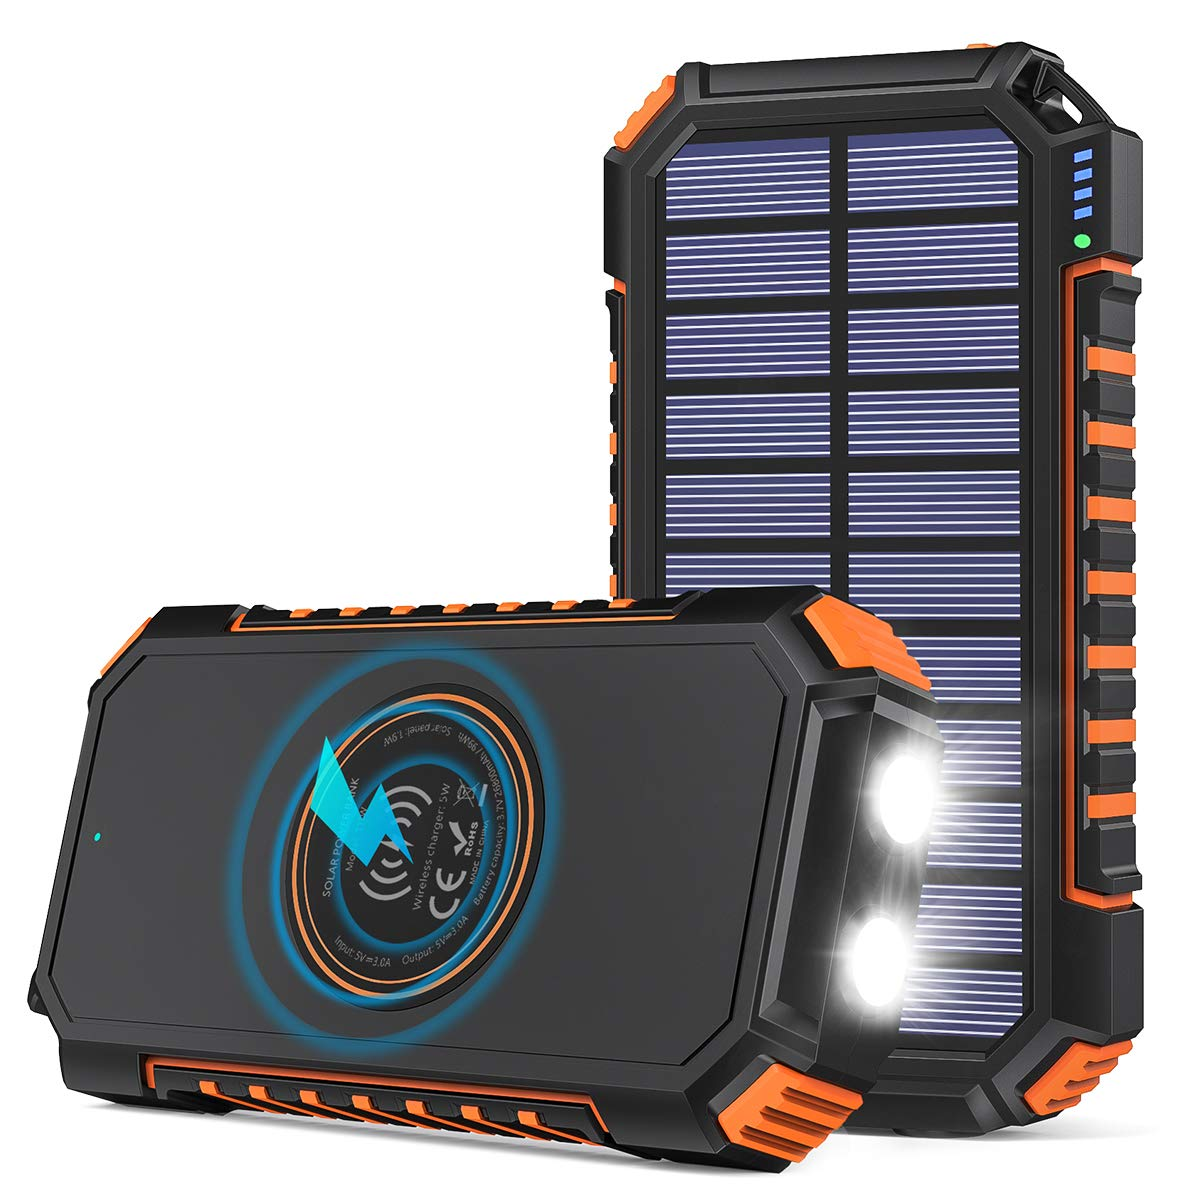 Solar Charger 26800mAh Riapow Solar Power Bank 4 Outputs USB C Quick